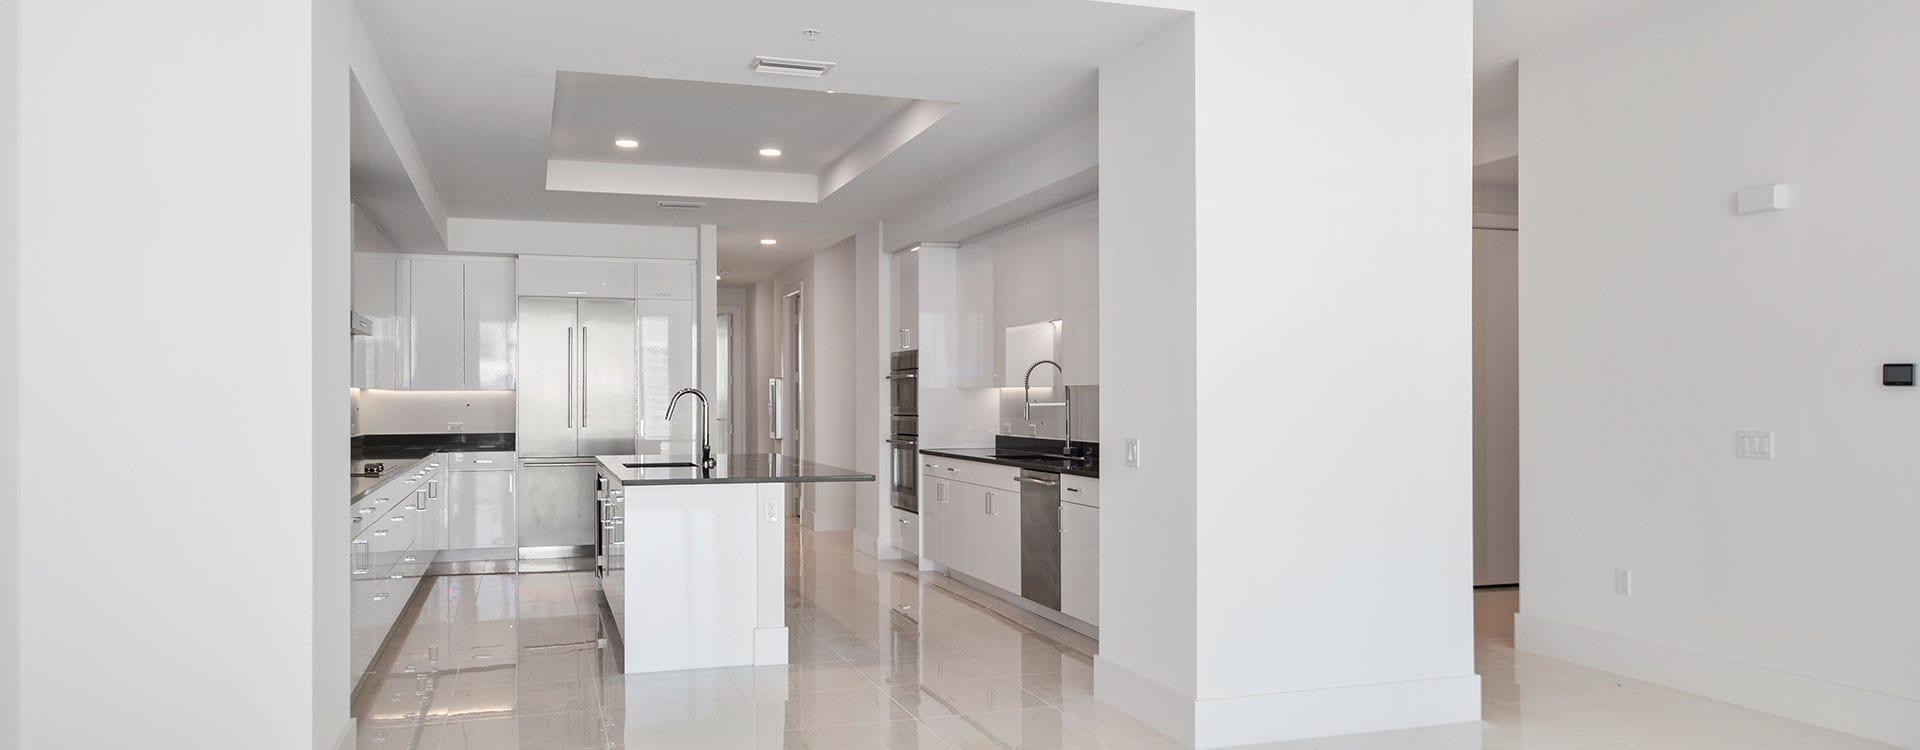 BLVD Residence 903 Great Room